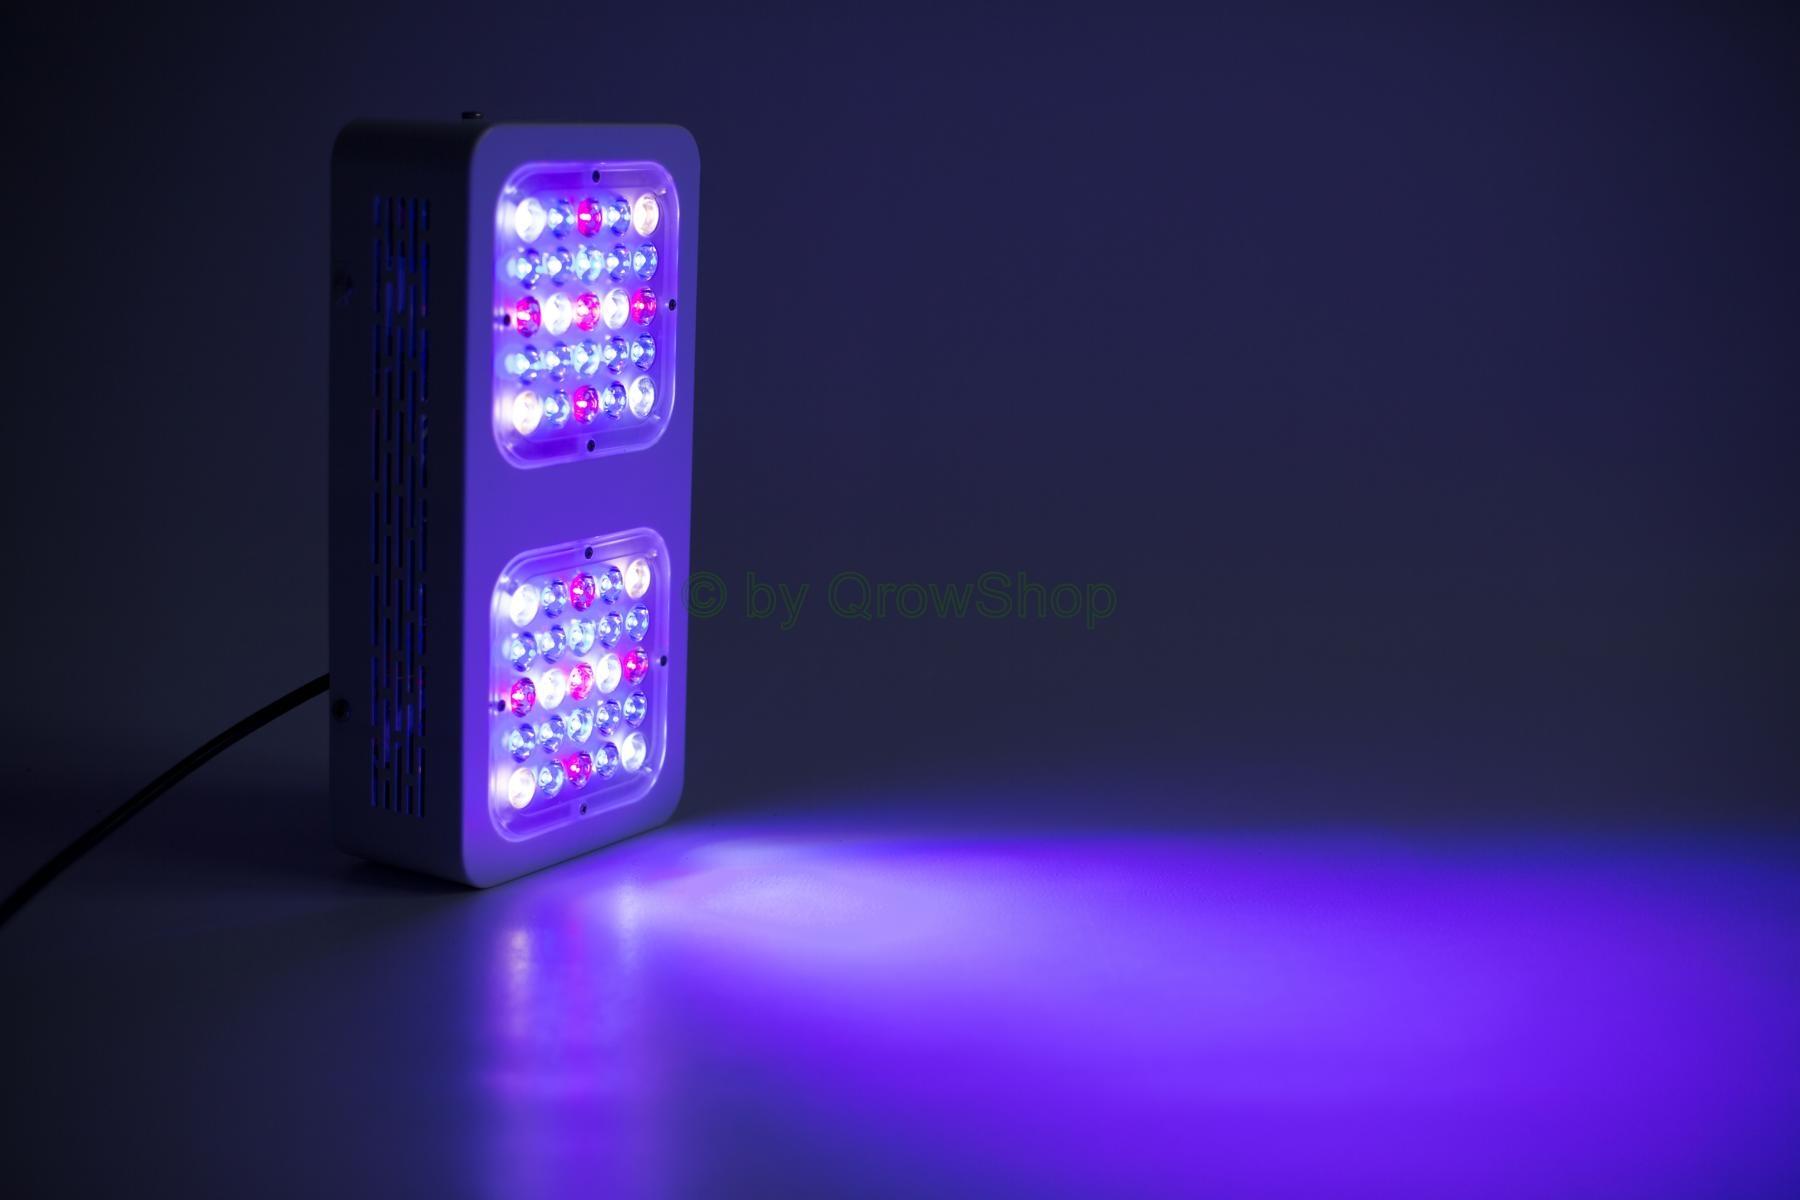 monster m2 led grow lampe wachstum f r 179 inkl versand. Black Bedroom Furniture Sets. Home Design Ideas